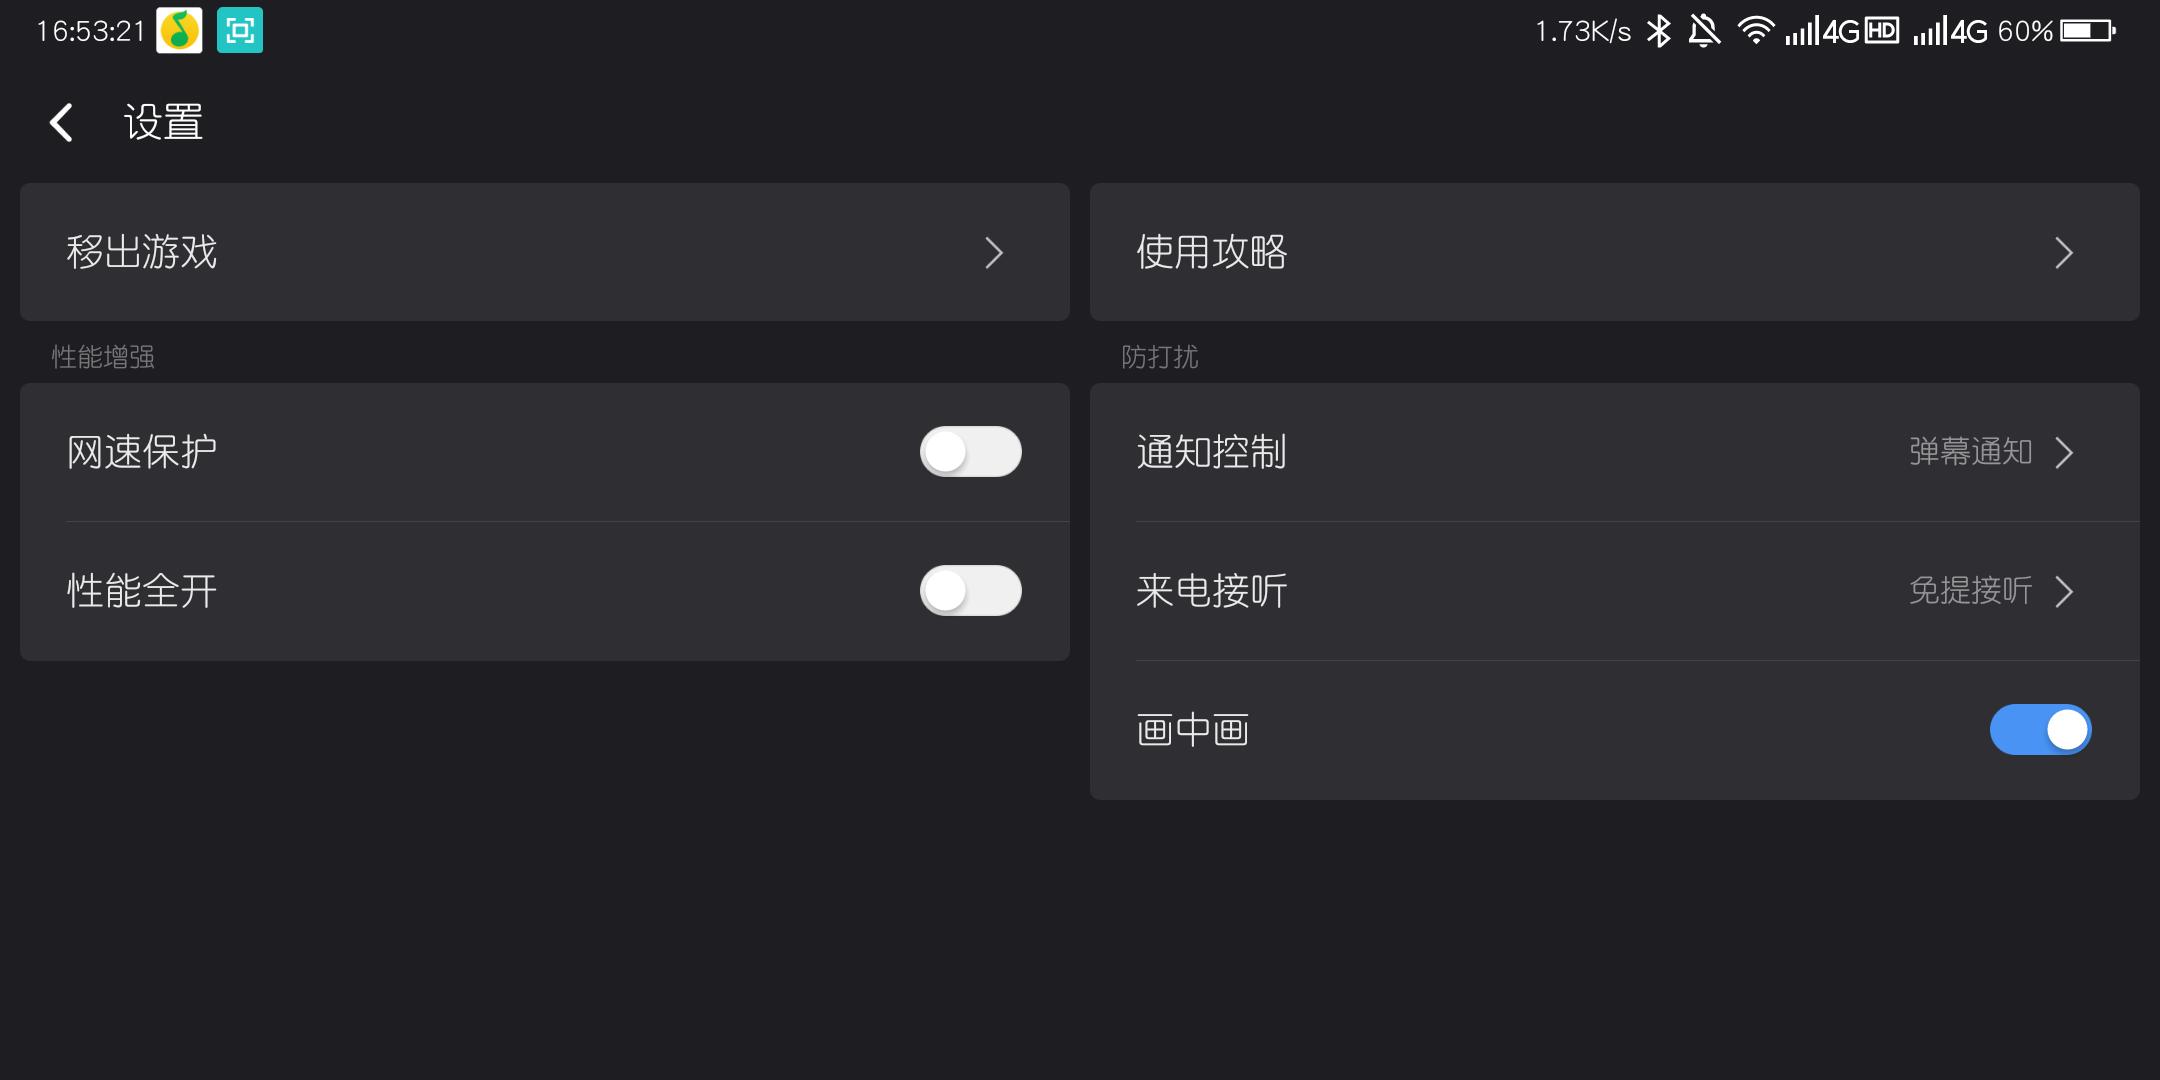 Screenshot_2018-10-31-16-53-23.png